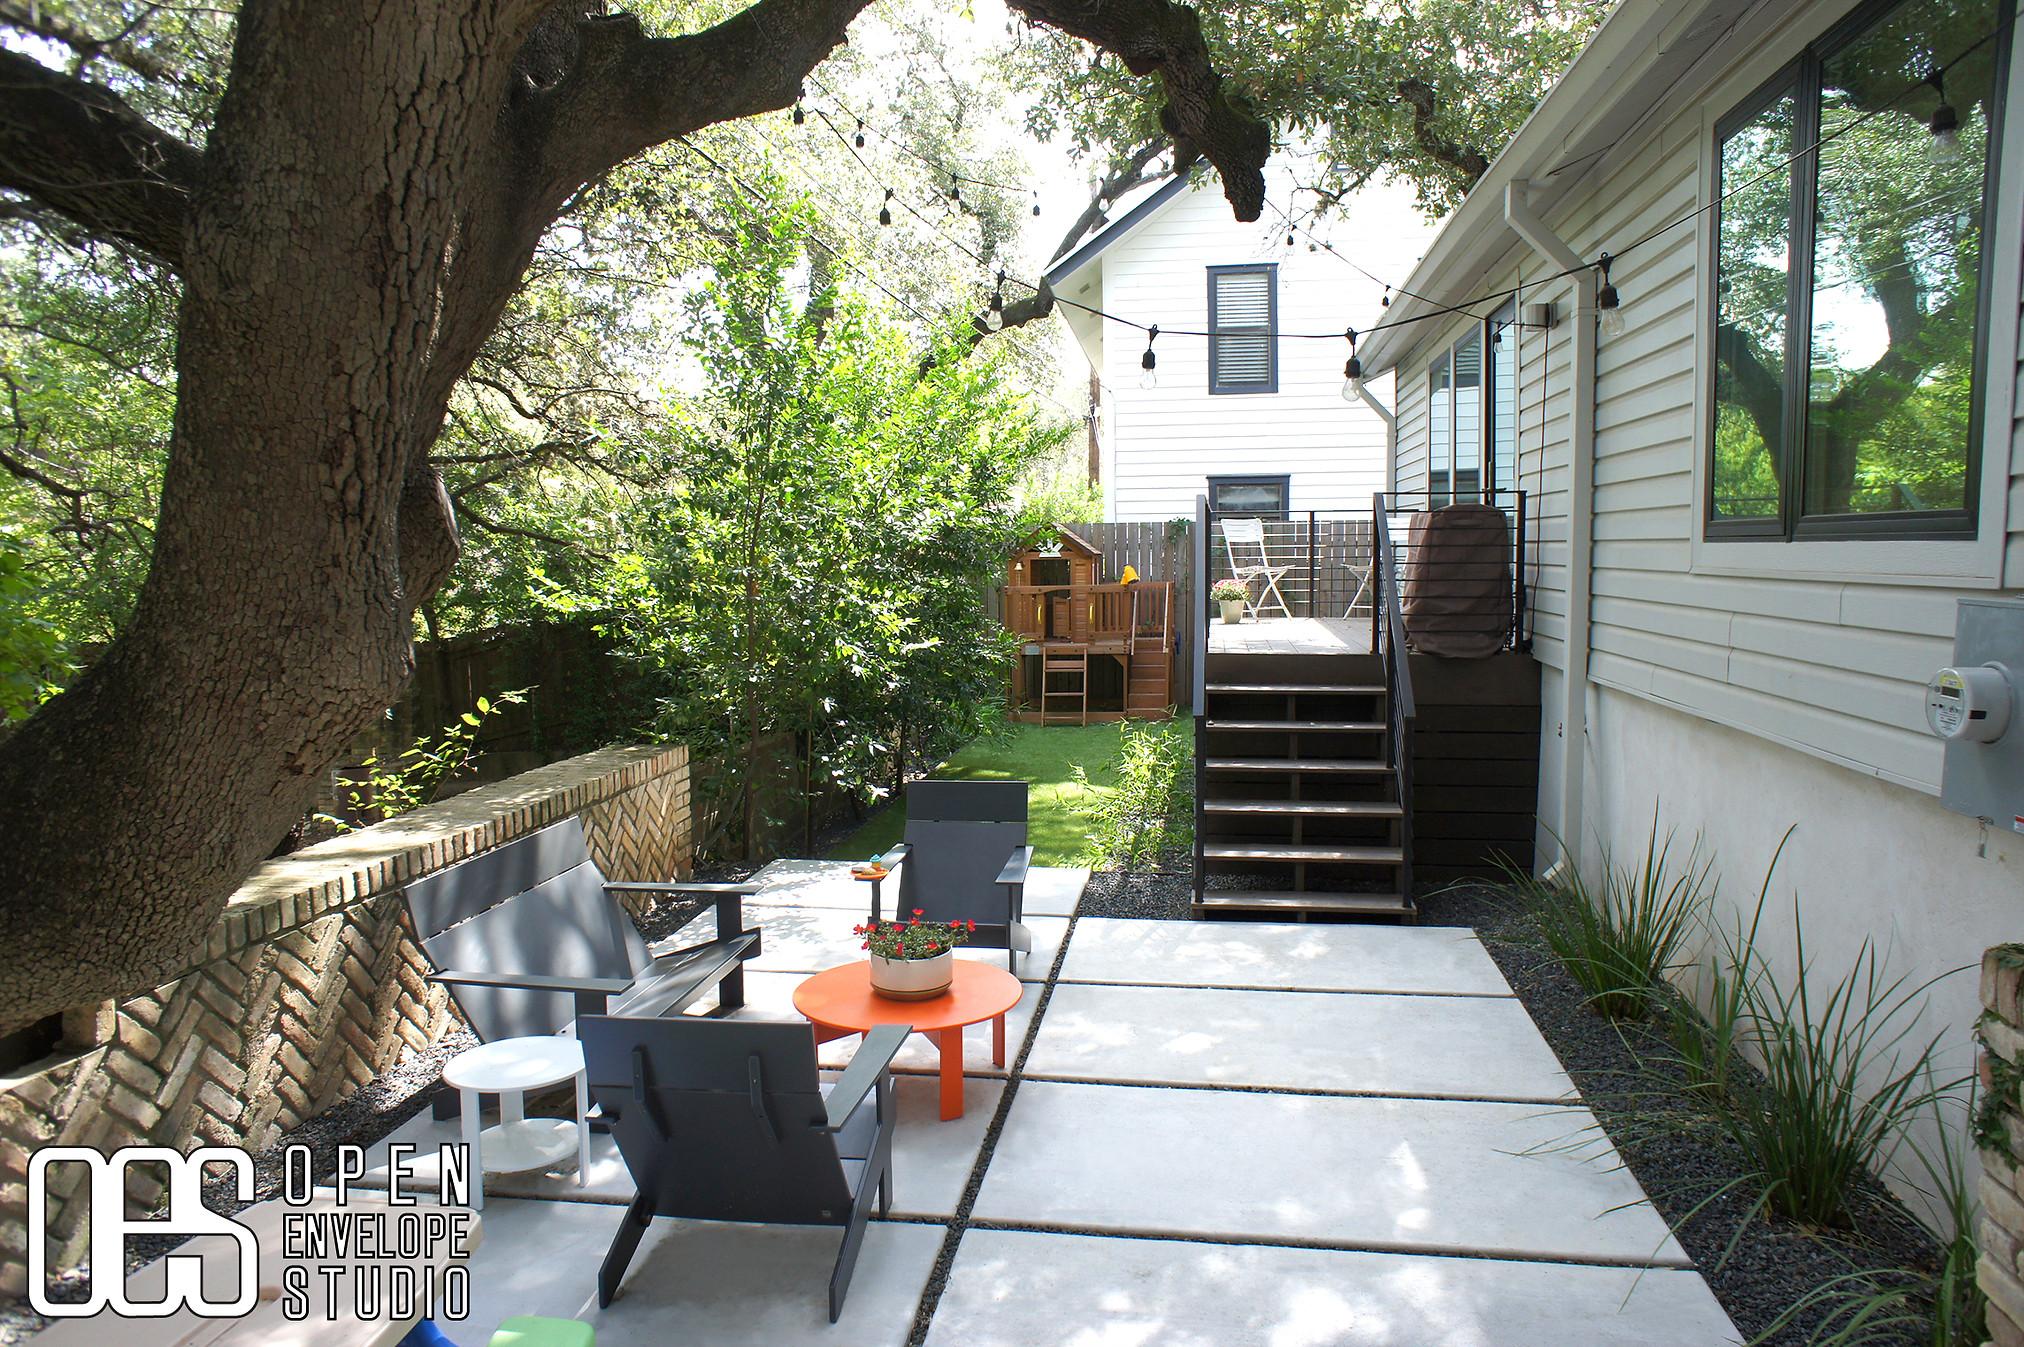 OES | concrete pavers, Texas basalt gravel, vegetation, artificial turf, deck cladding